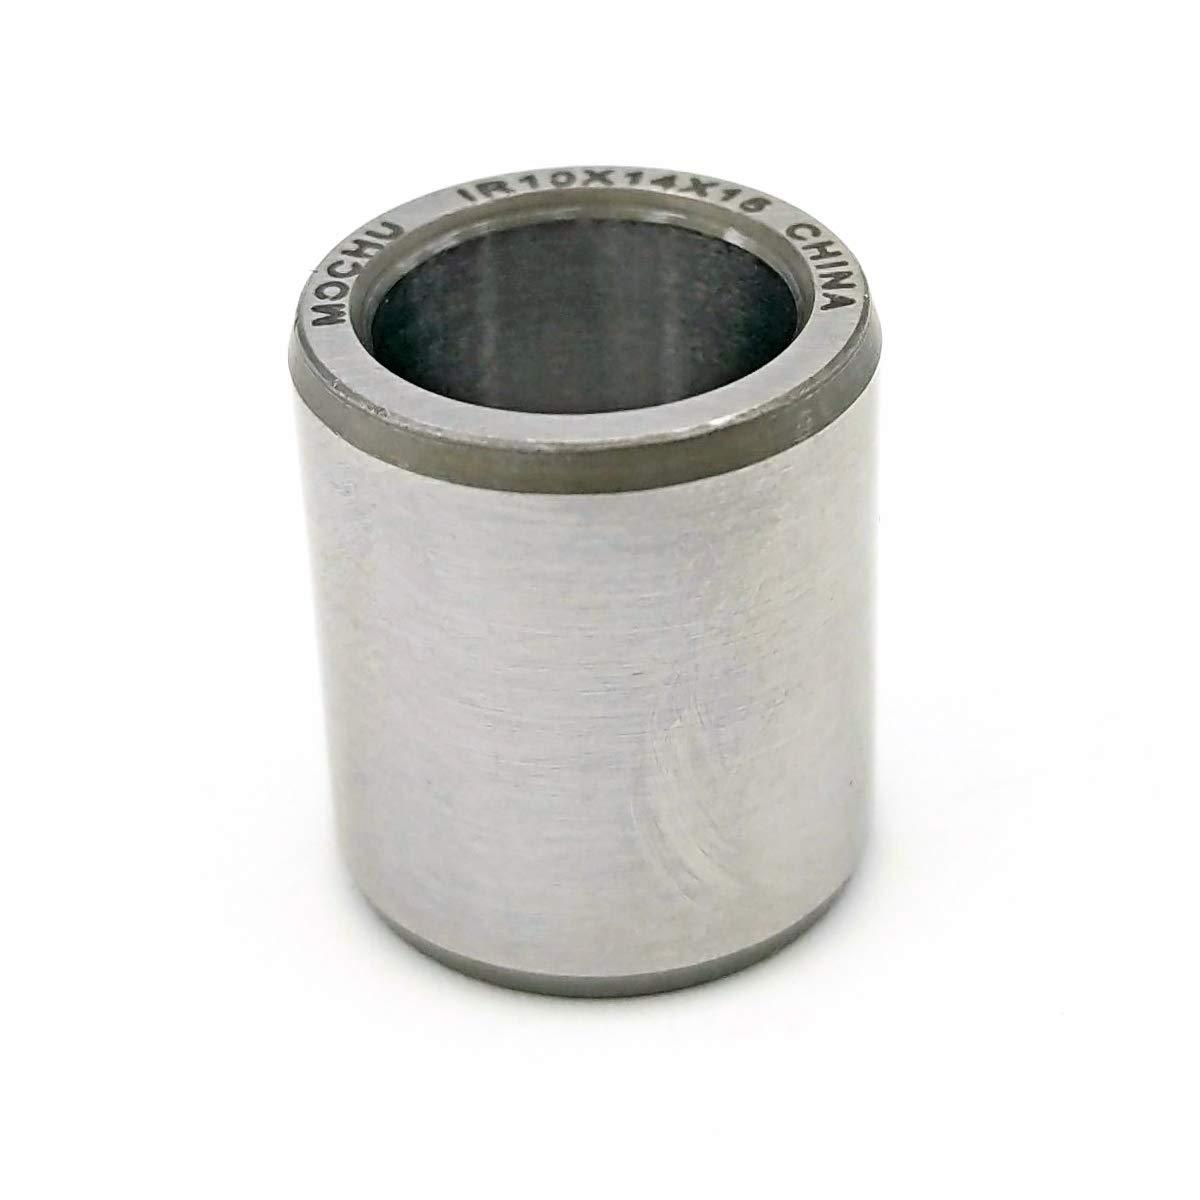 Precision Ground Metric MOCHU IR10X14X16 IR 10X14X16 IRT1016 IR101416 Needle Roller Bearing Inner Ring